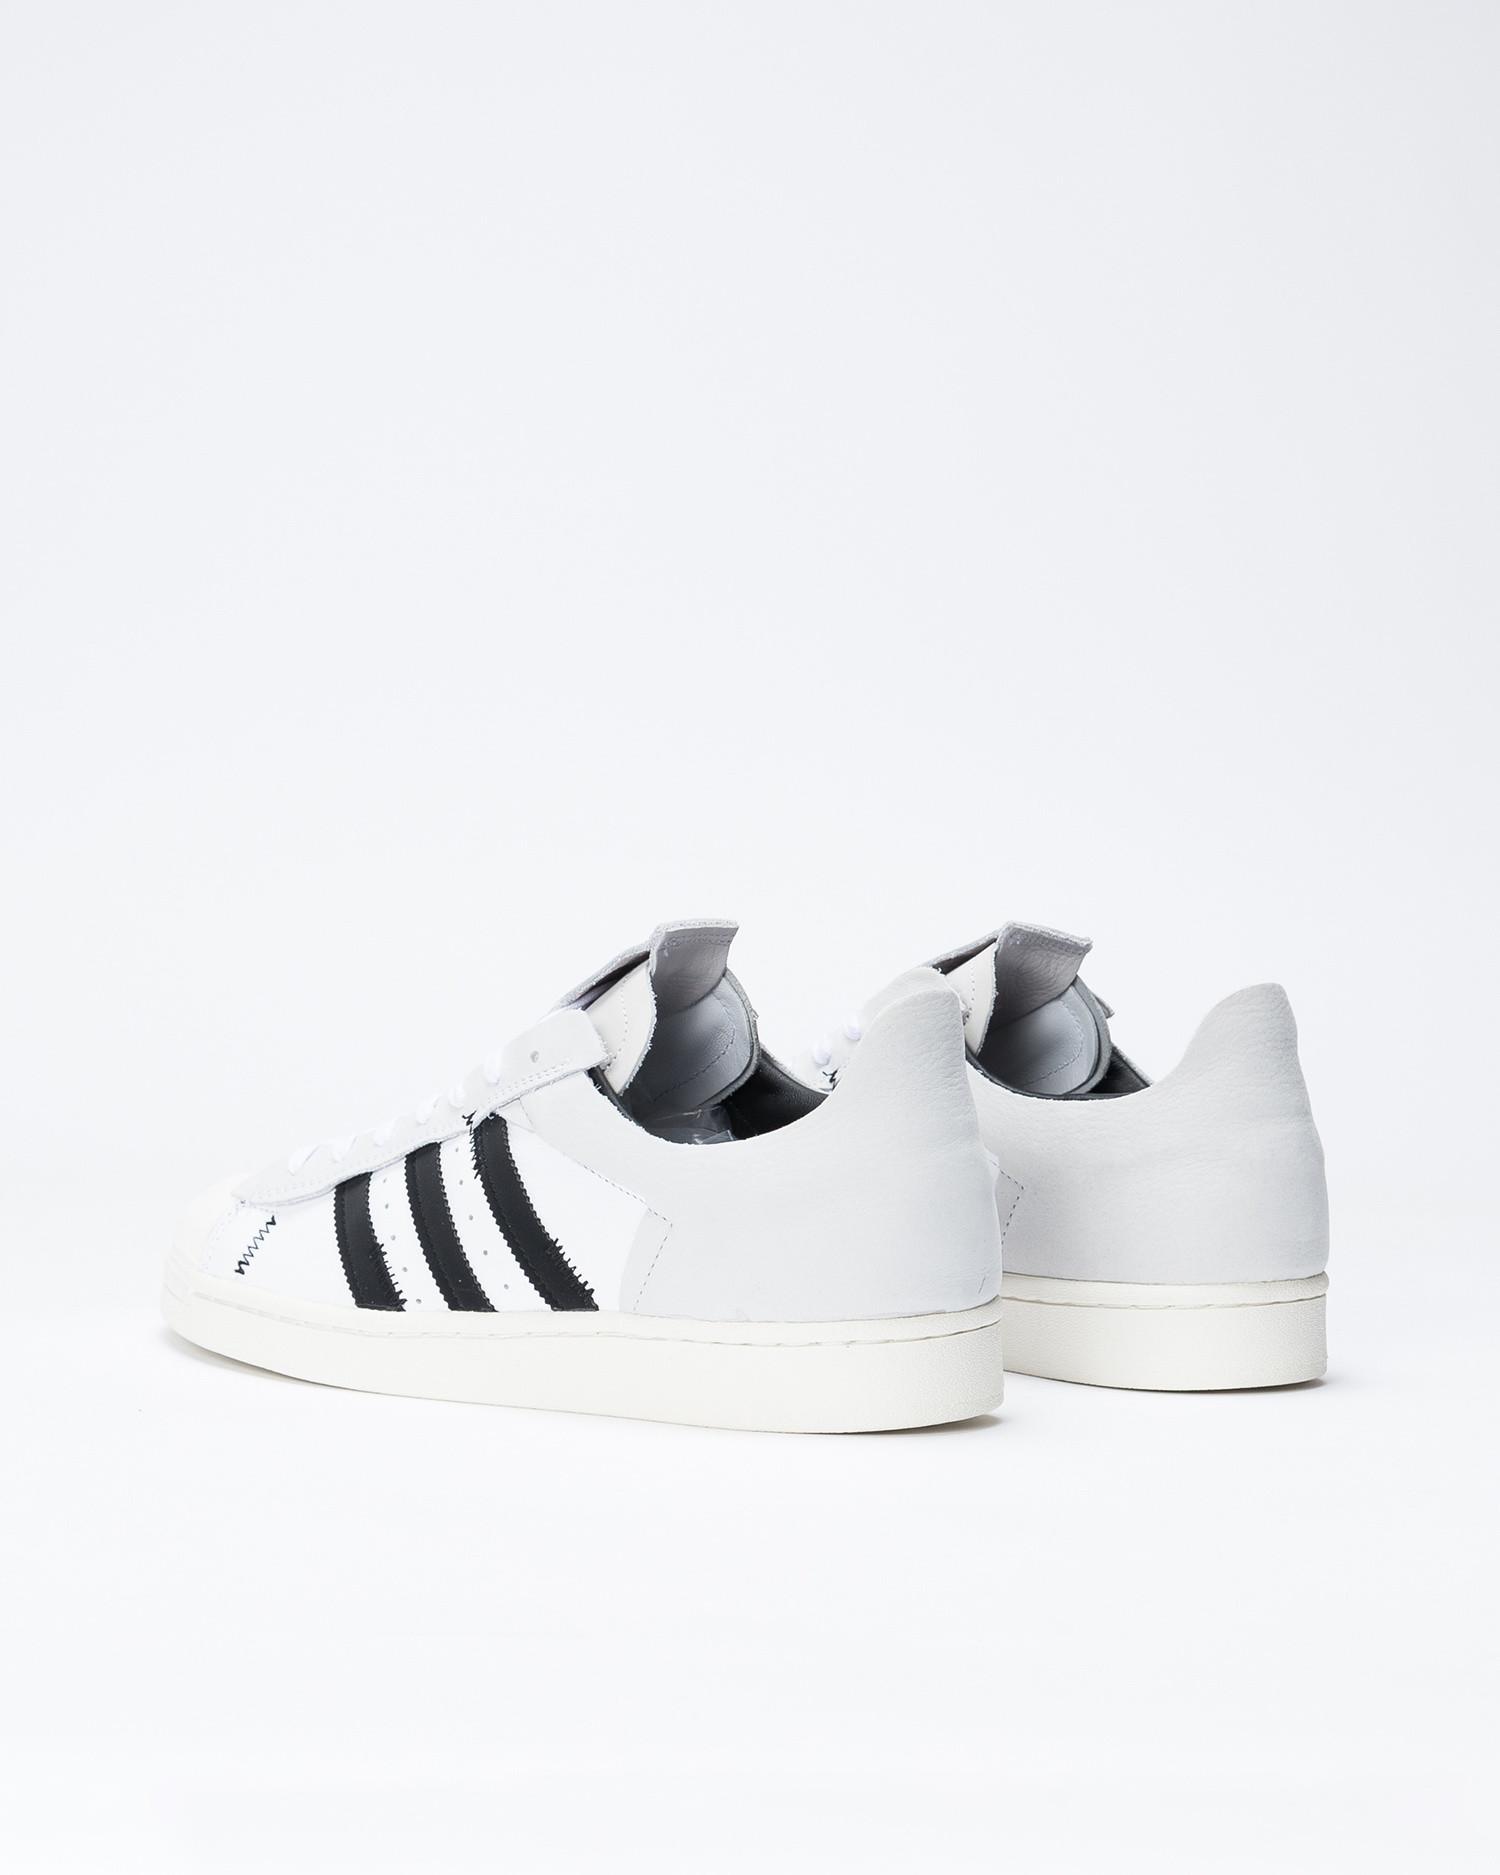 Adidas Superstar WS2 Ftwwht/Cblack/Owhite